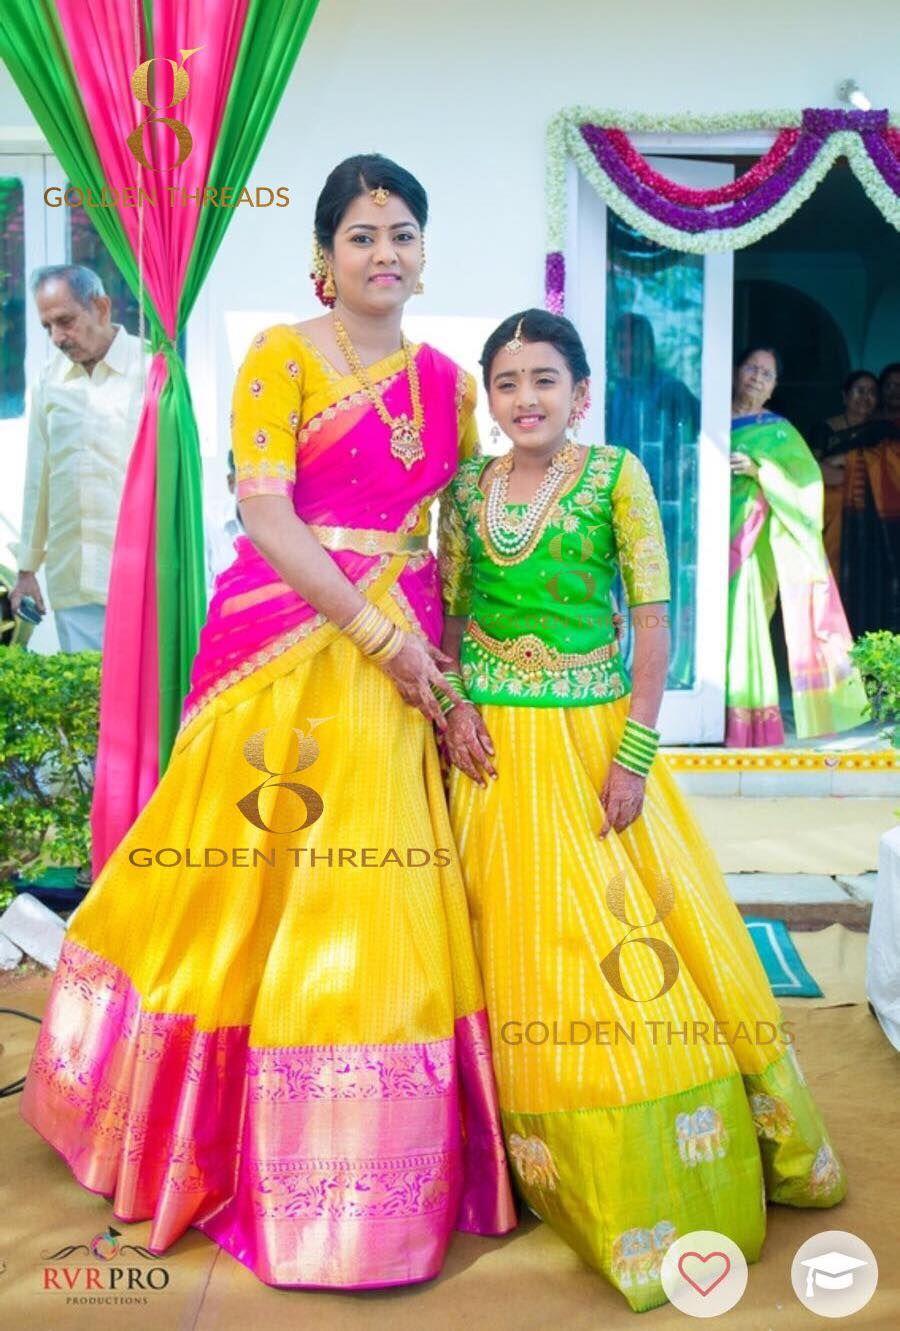 ad4aa913ac4ec3 The lovely mom daughter duo in kavithagutta kanchipuram lehengas. 26 May  2017